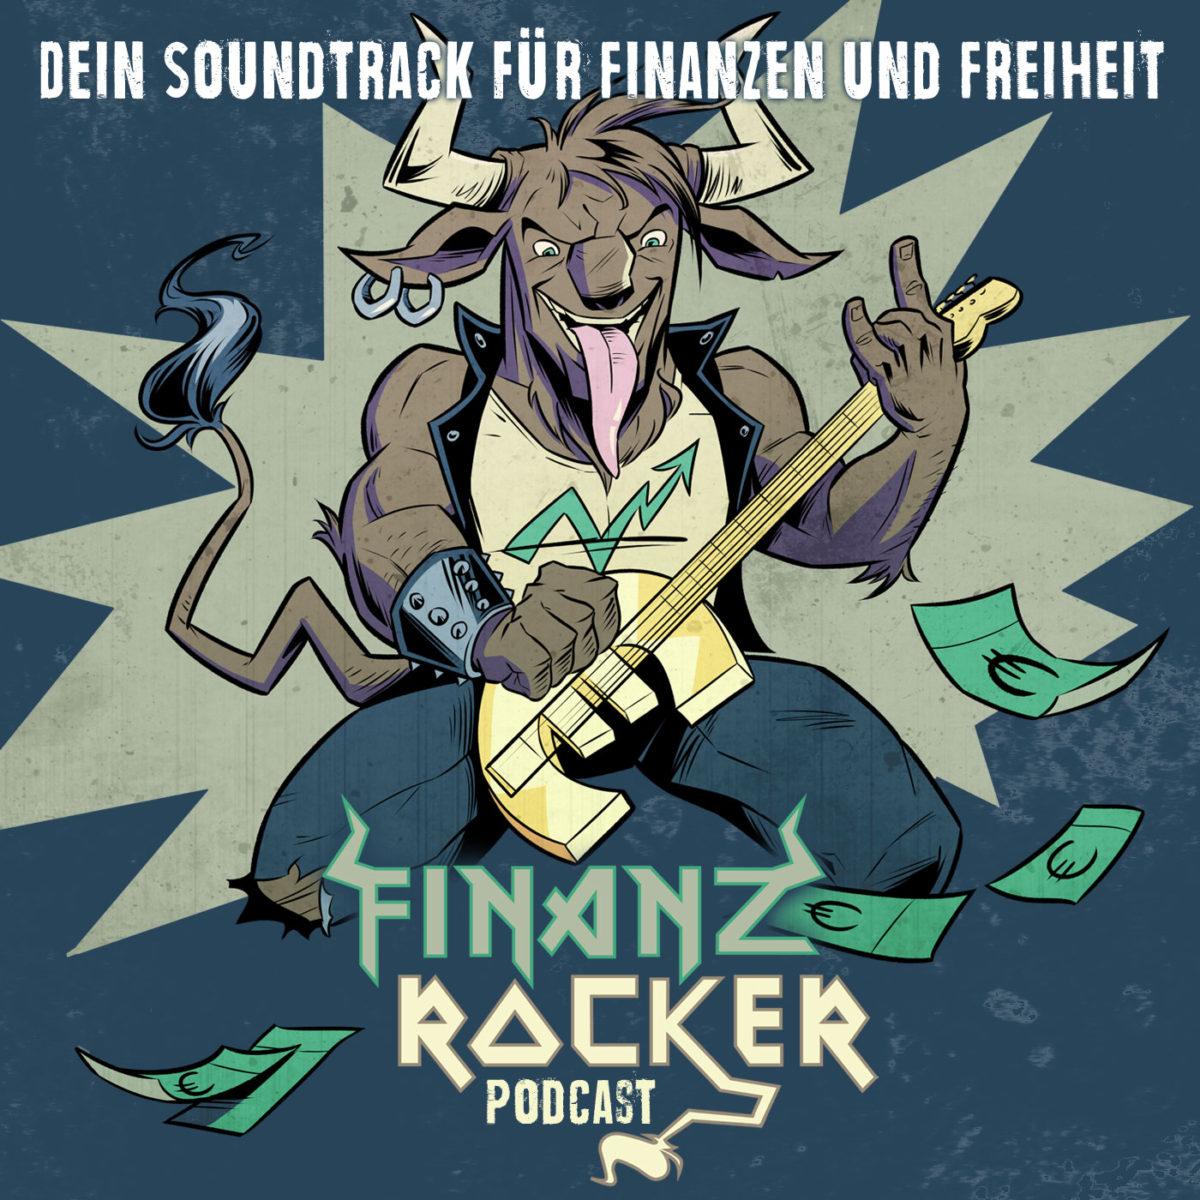 Divantis (erneut) im Finanzrocker-Podcast zu Gast